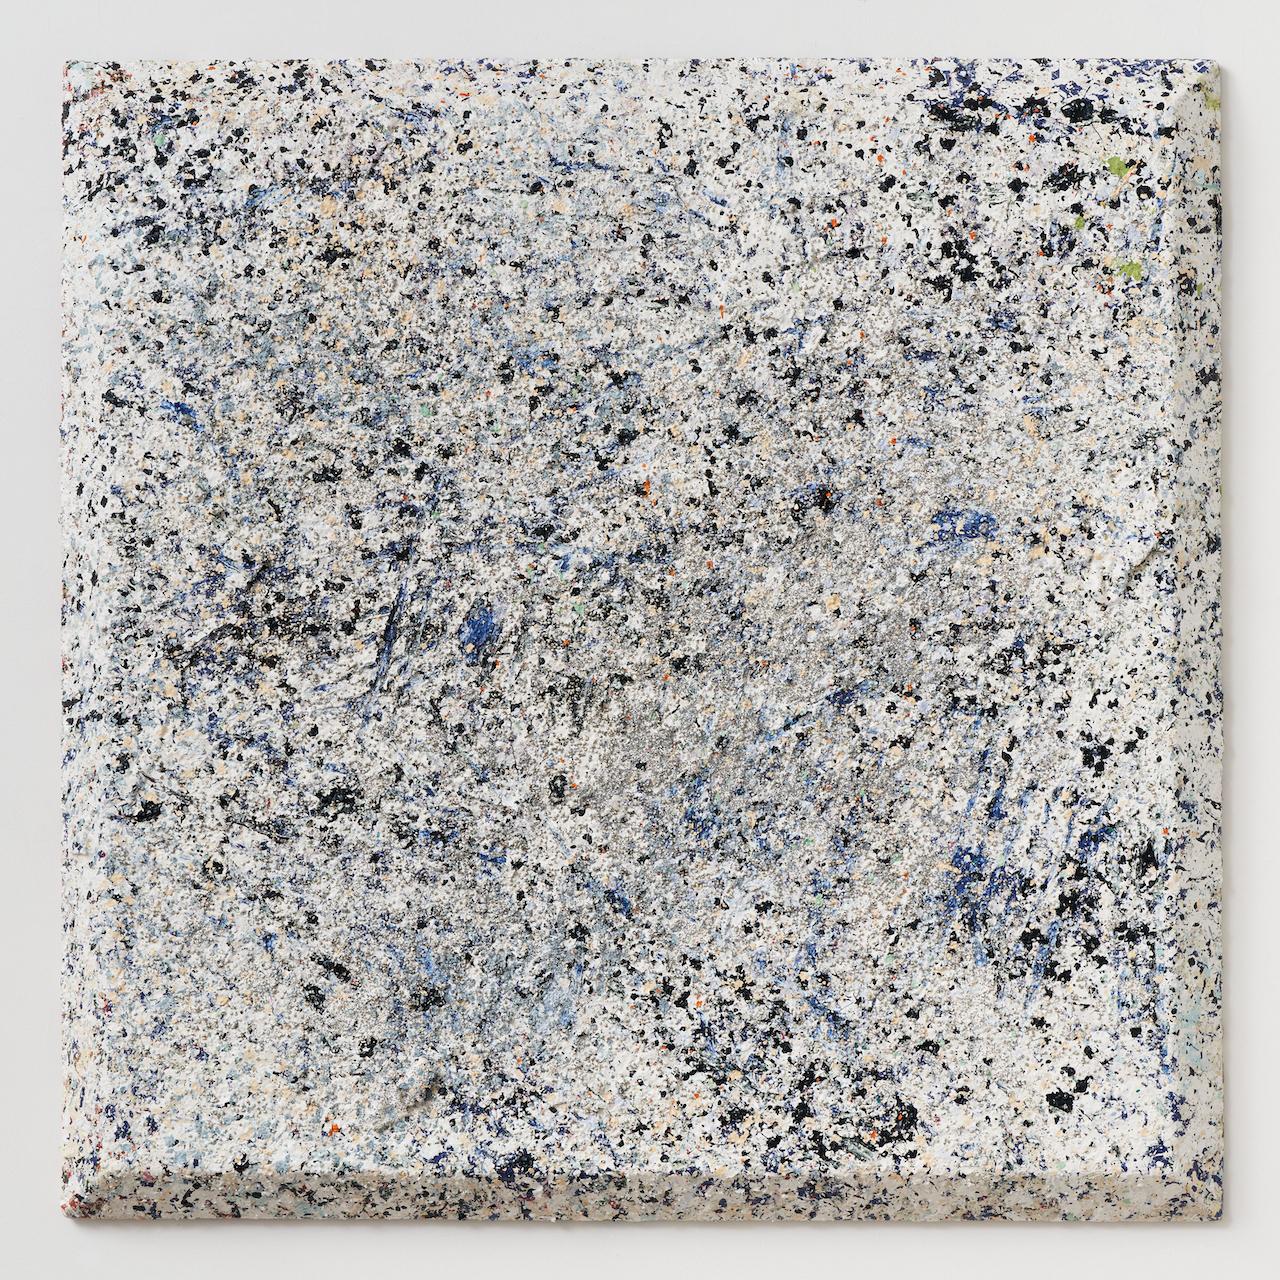 "Sam Gilliam No Change, 2021 acrylic on canvas, bevel-edge 48"" × 48"" × 3-1/4"" (121.9 cm × 121.9 cm × 8.3 cm). Sam Gilliam 2-3/F, 267 Itaewon-ro, Yongsan-gu, Seoul May 27 – July 10, 2021. Photography courtesy of Pace Gallery."